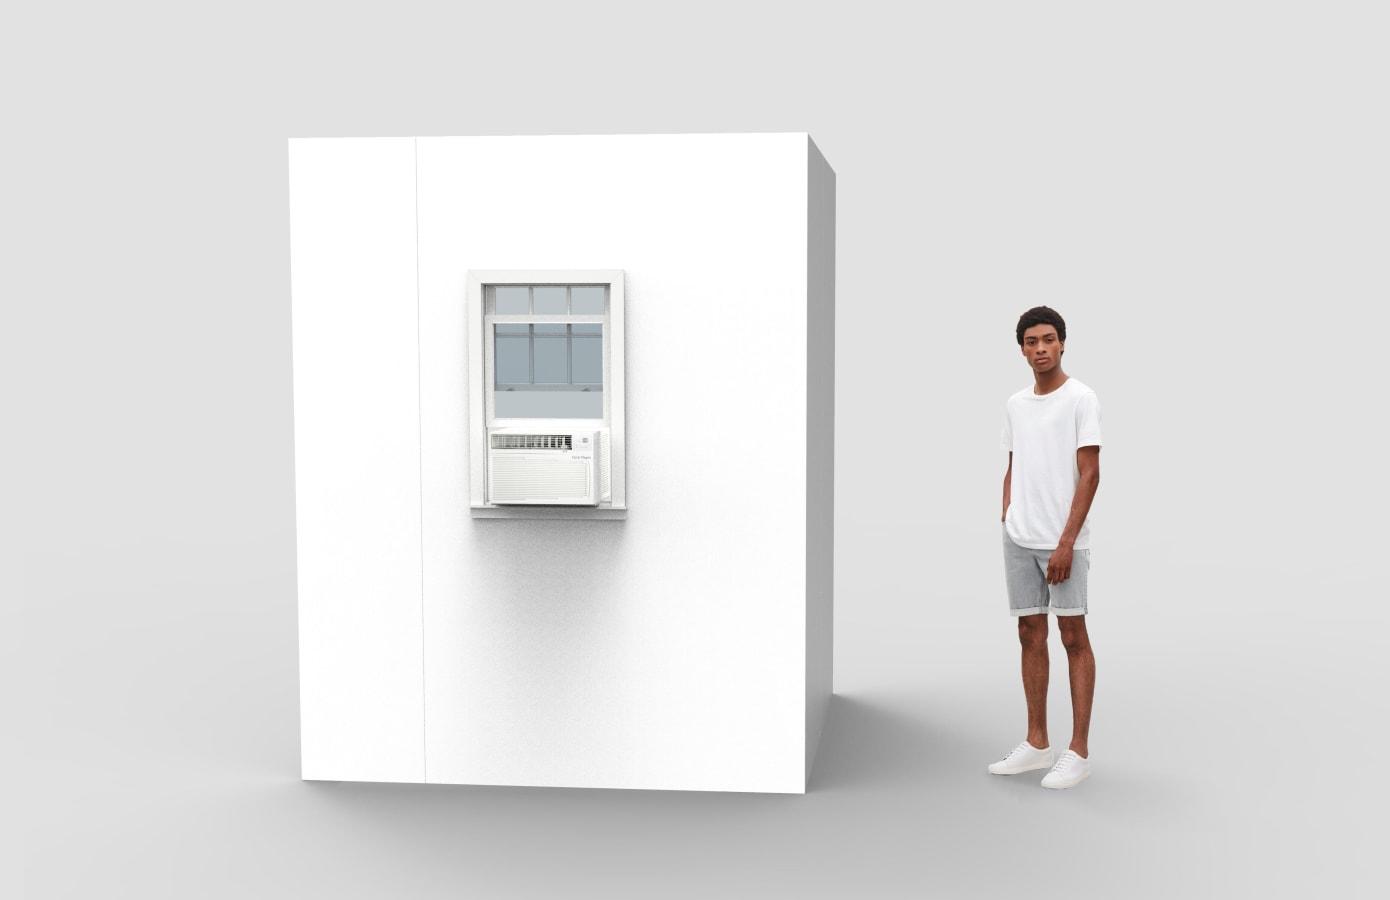 Art Rotterdam 2020, Philip Akkerman, Casper Braat, Erik de Bree, Popel Coumou, Thijs Zweers,